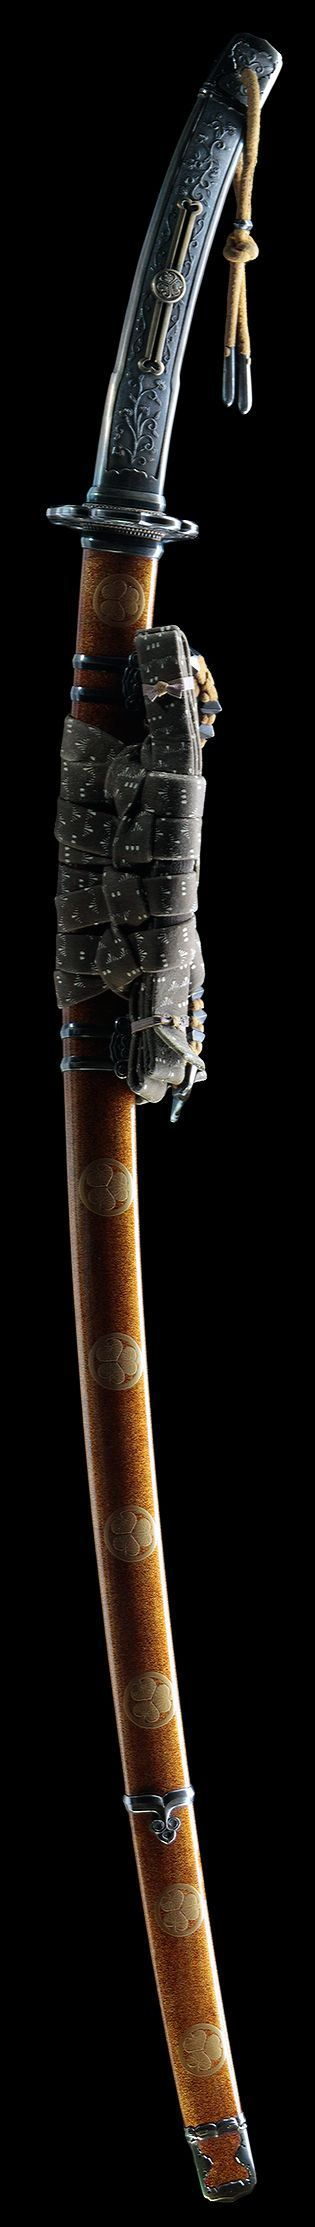 A tachi sword. Similar to the katana, these swords were worn by the samurai class of feudal Japan.  #swords